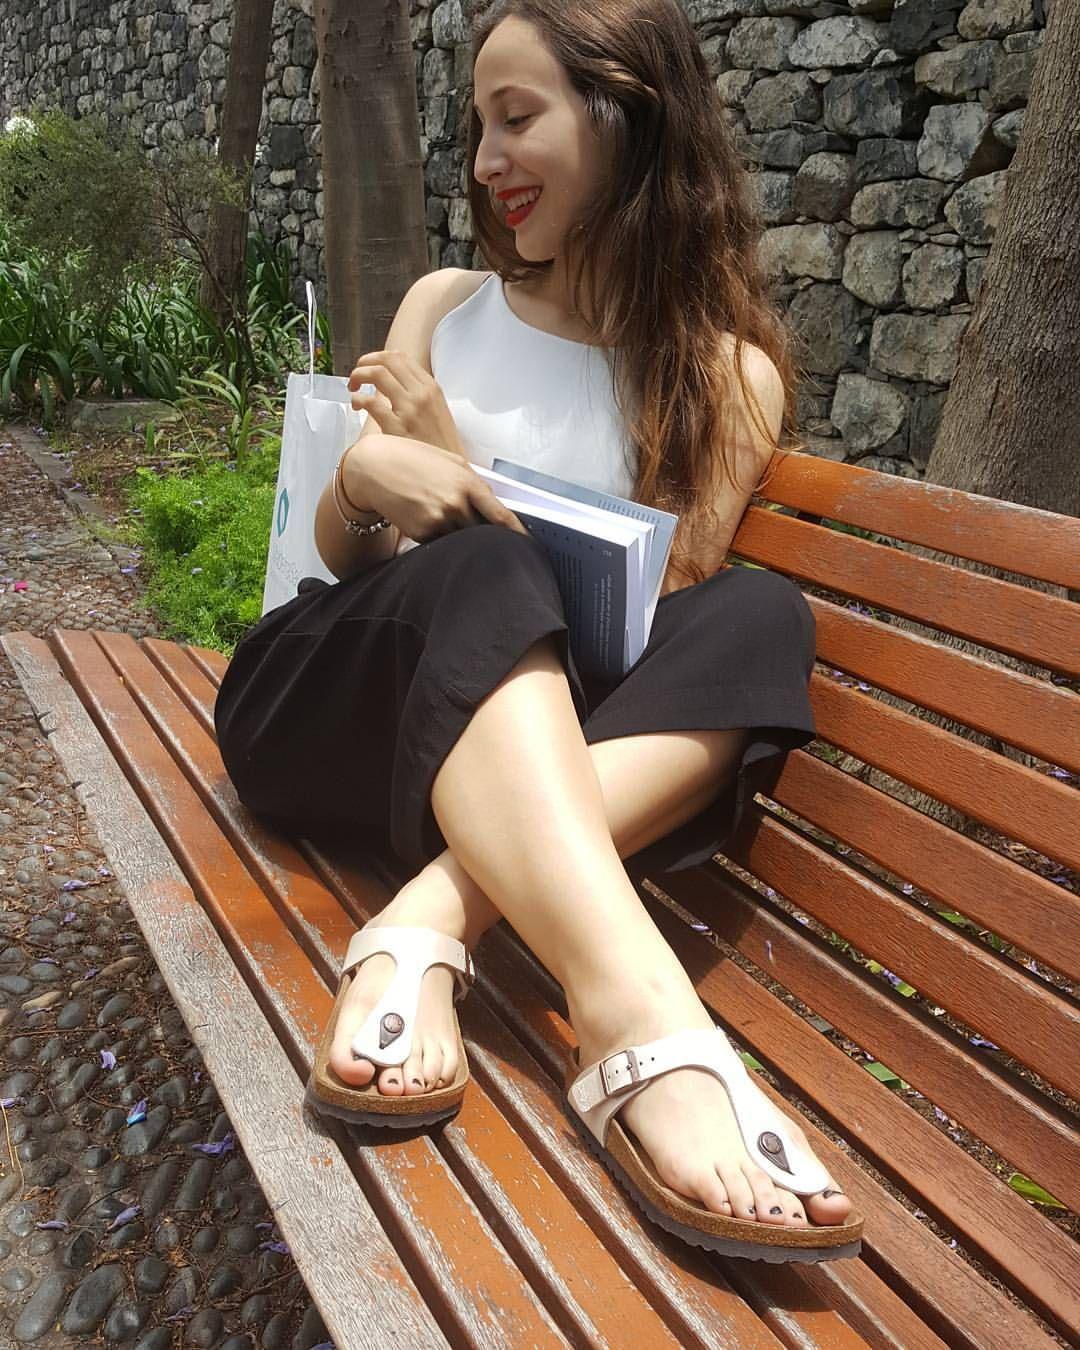 Pin by Jett Blast on Cool sandals! | Barefoot girls, Cigar